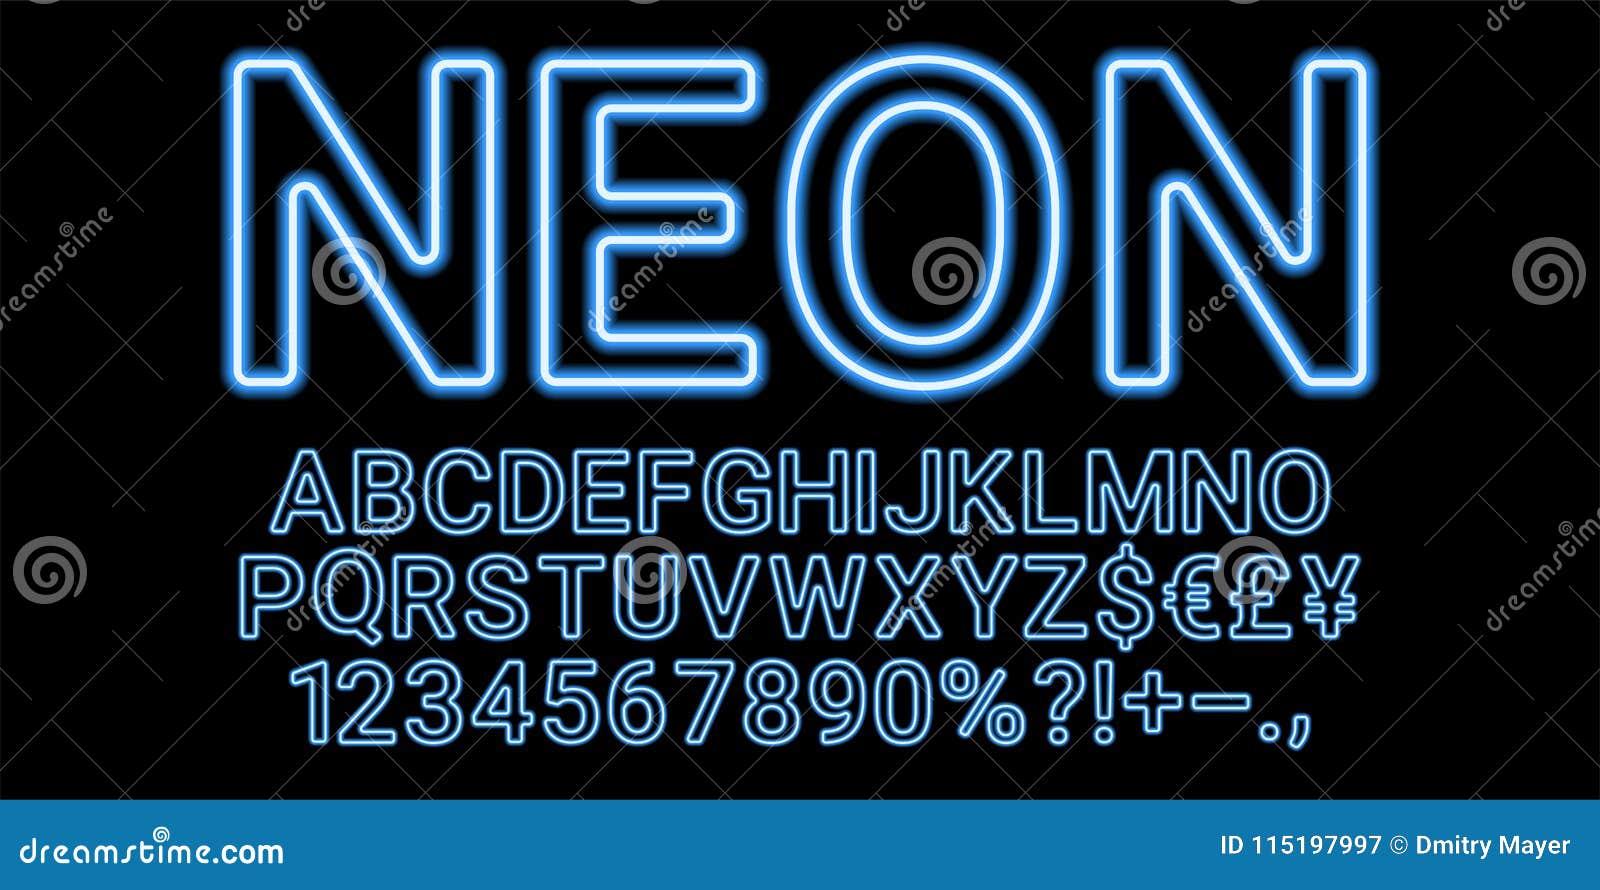 neon font in light blue color